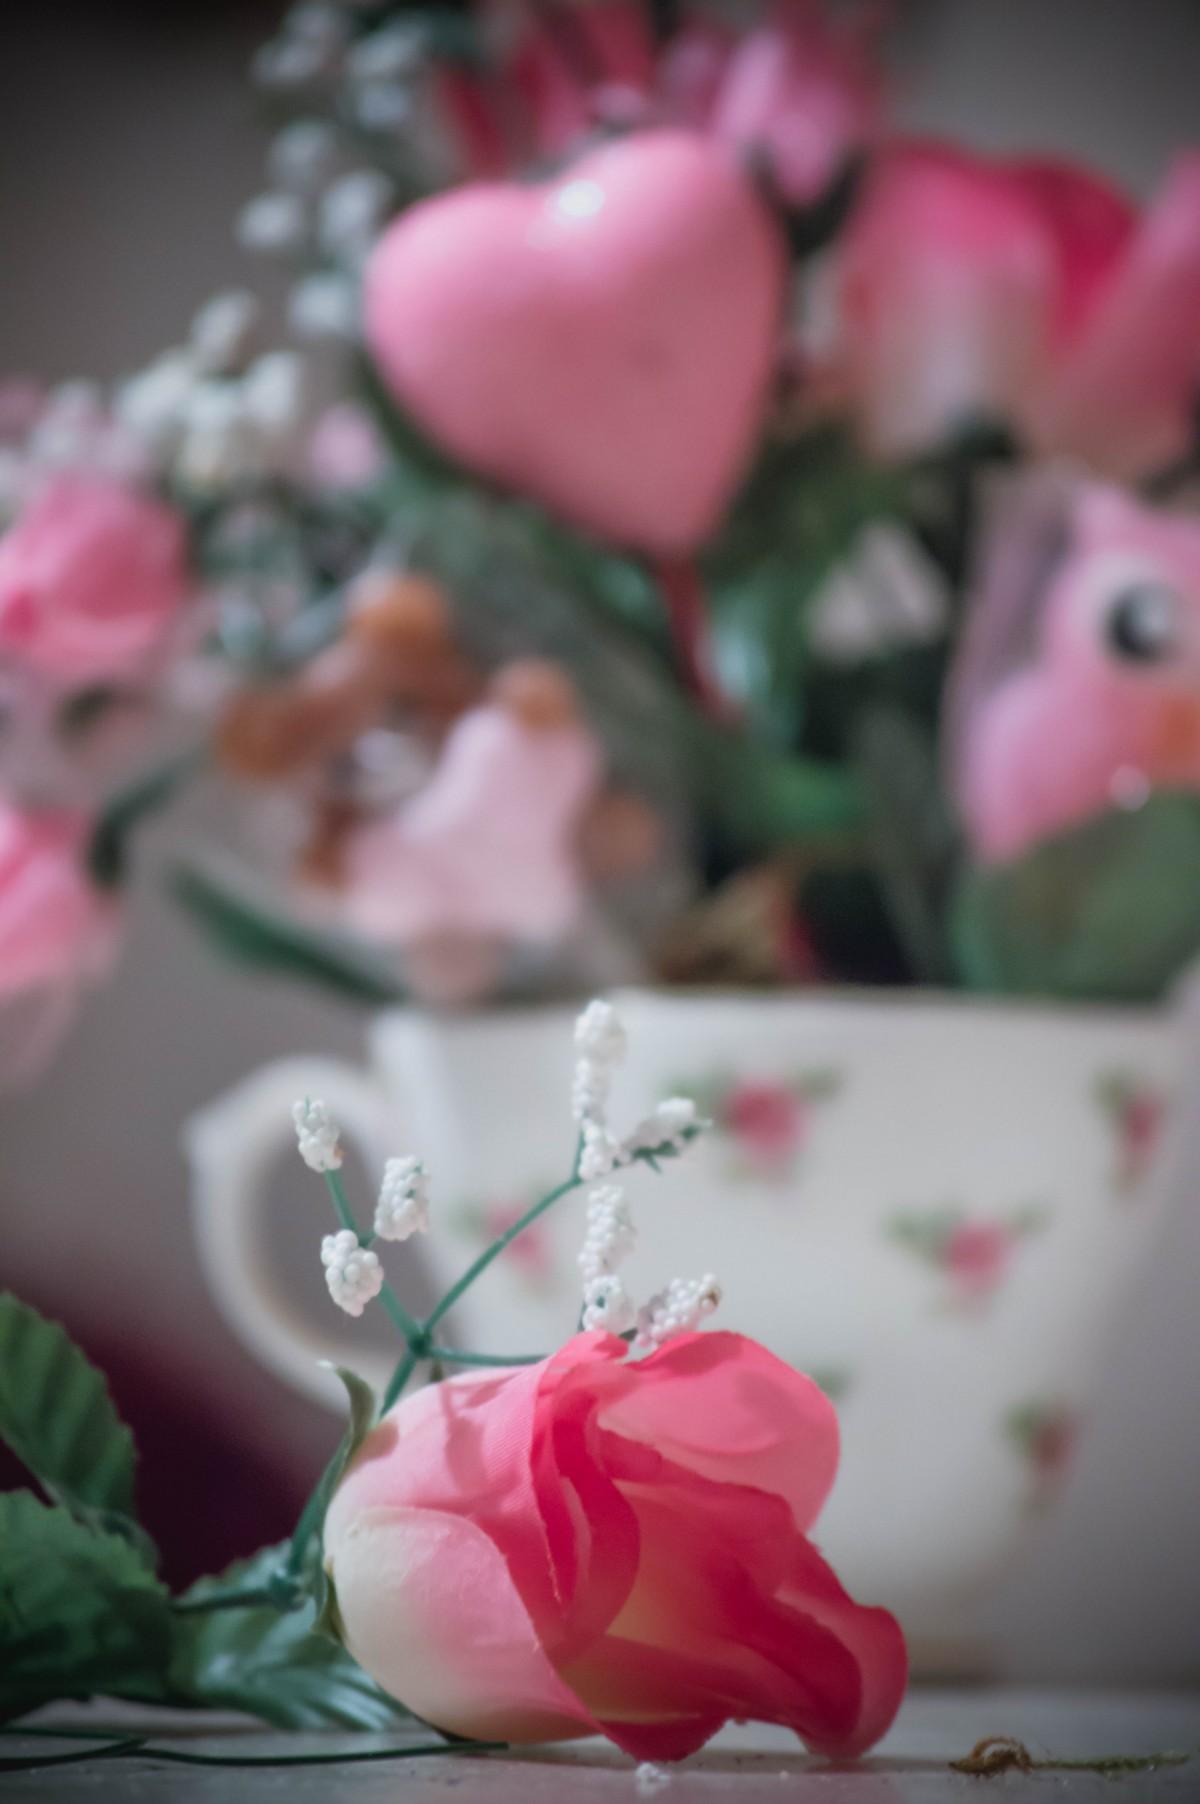 Free Images Flower Petal Love Heart Rose Food Red